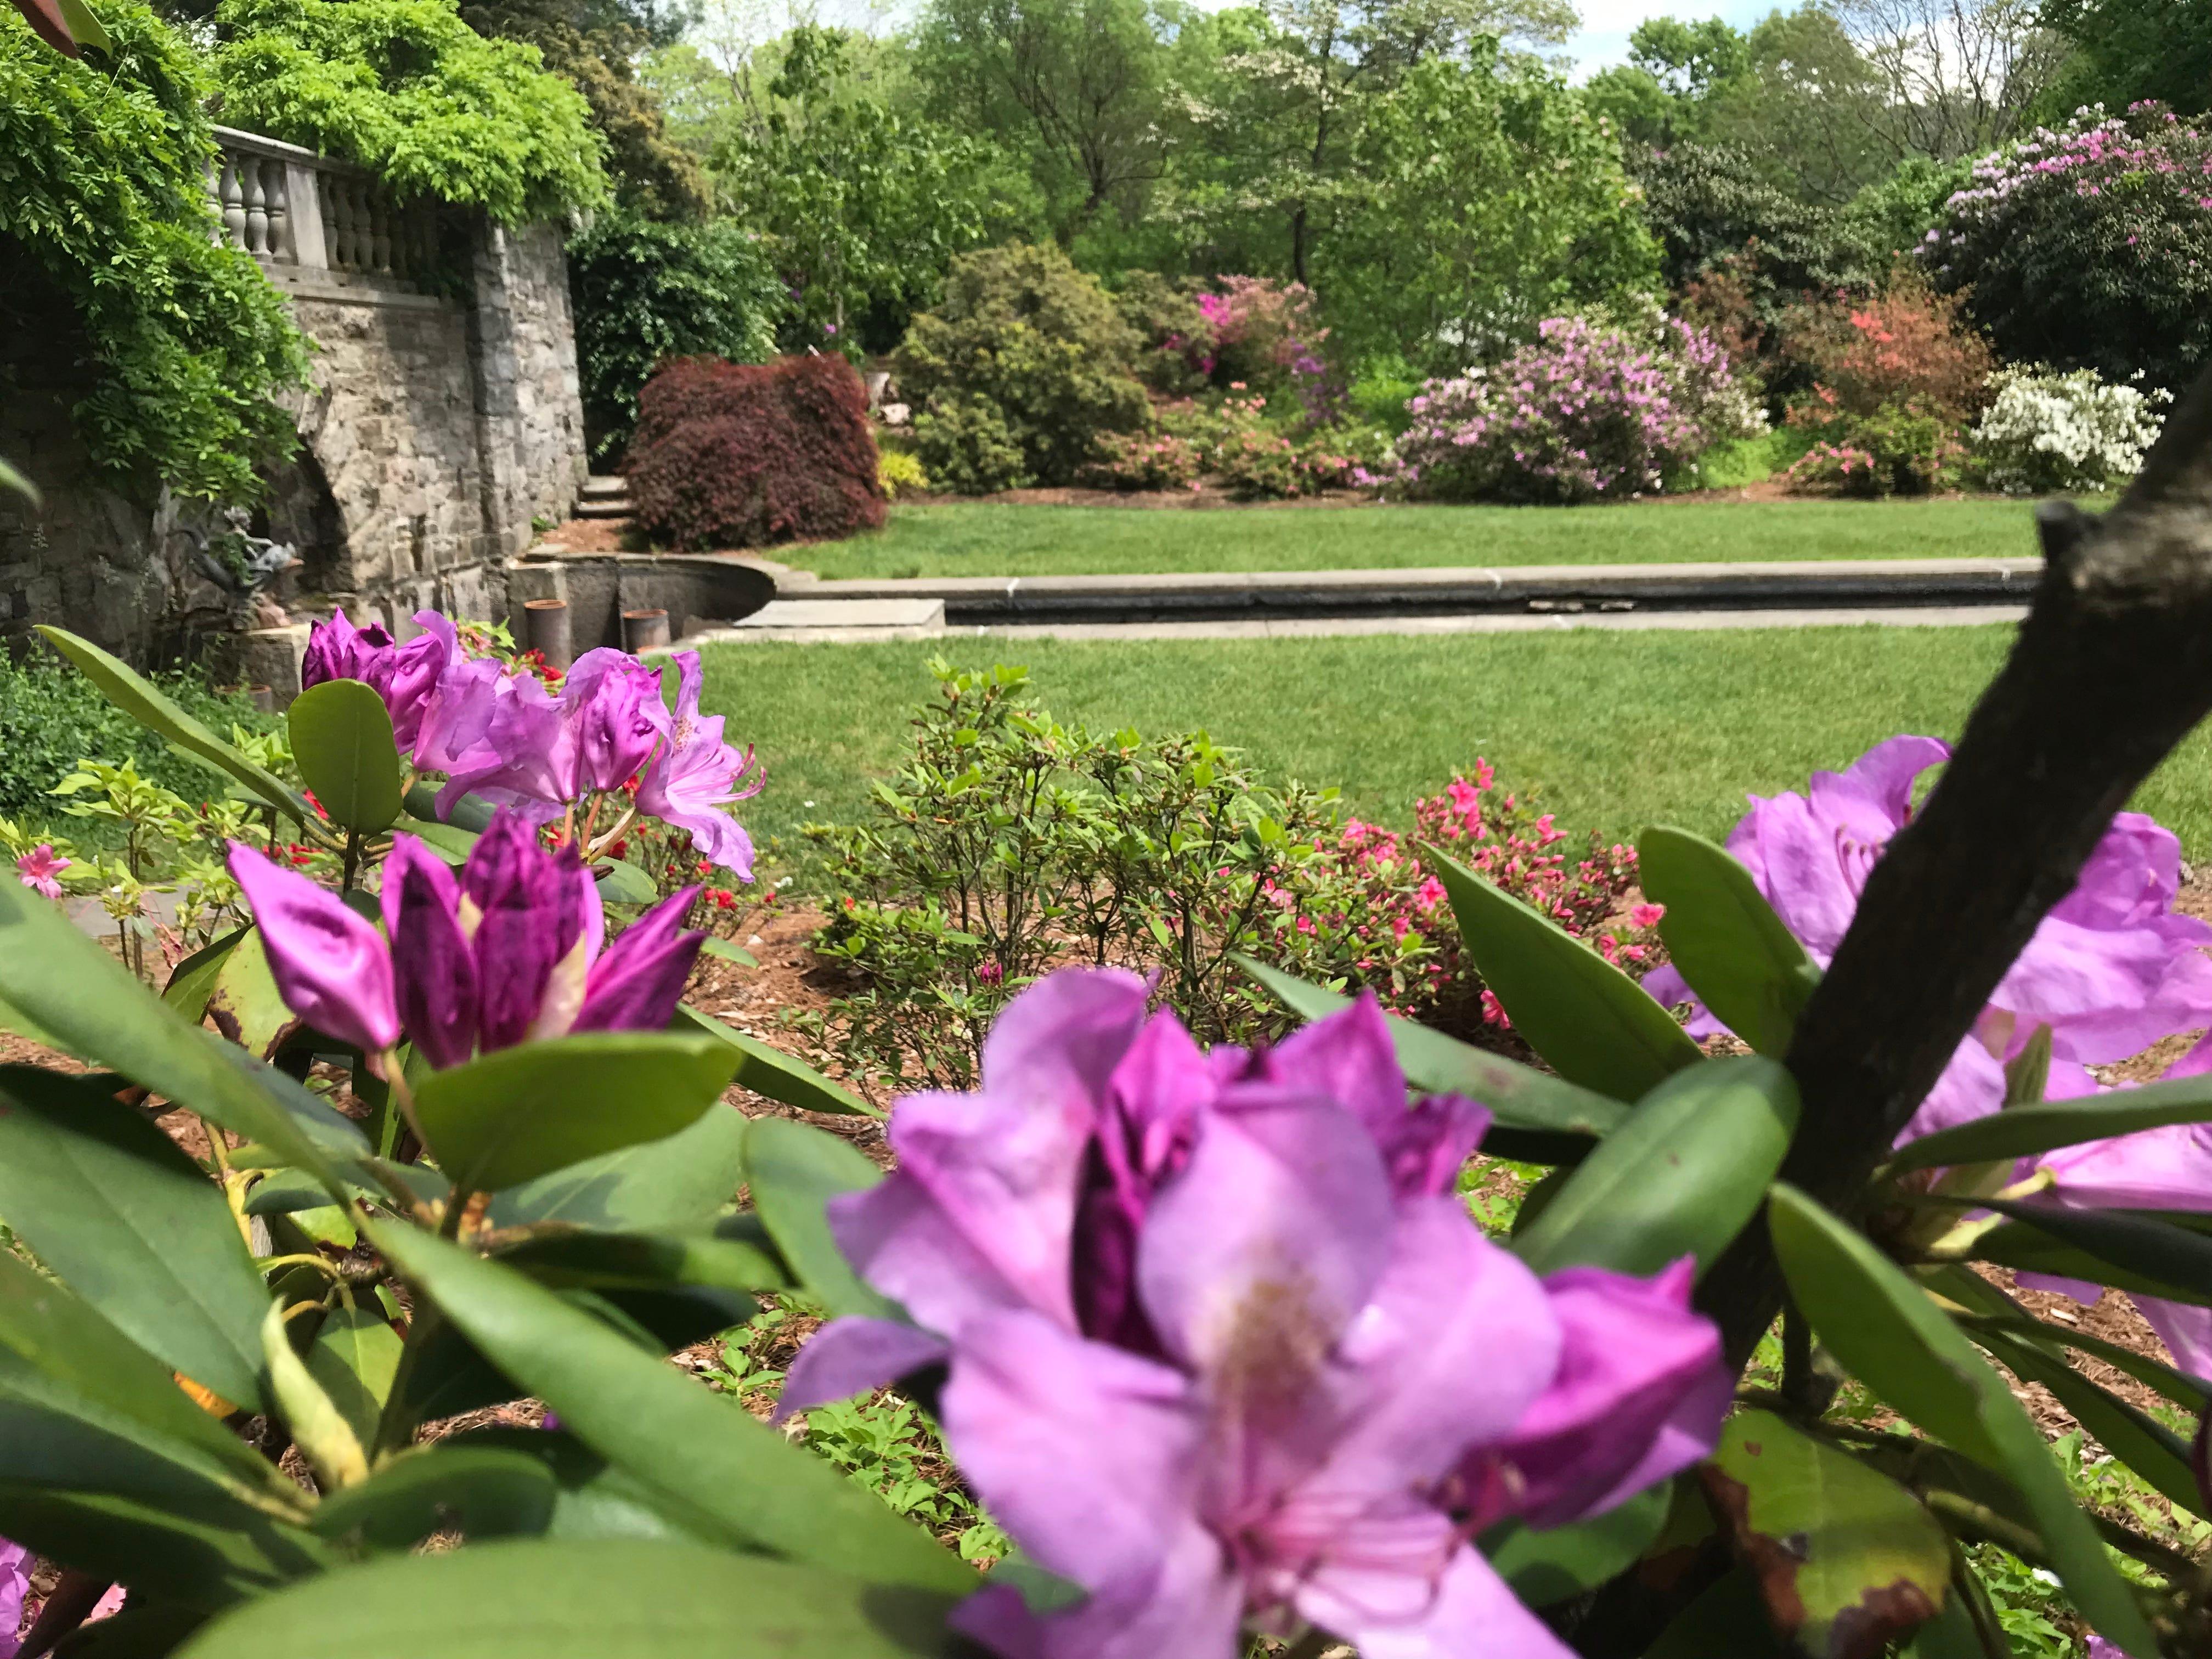 Video: New Jersey Botanical Garden's colorful azaleas bloom